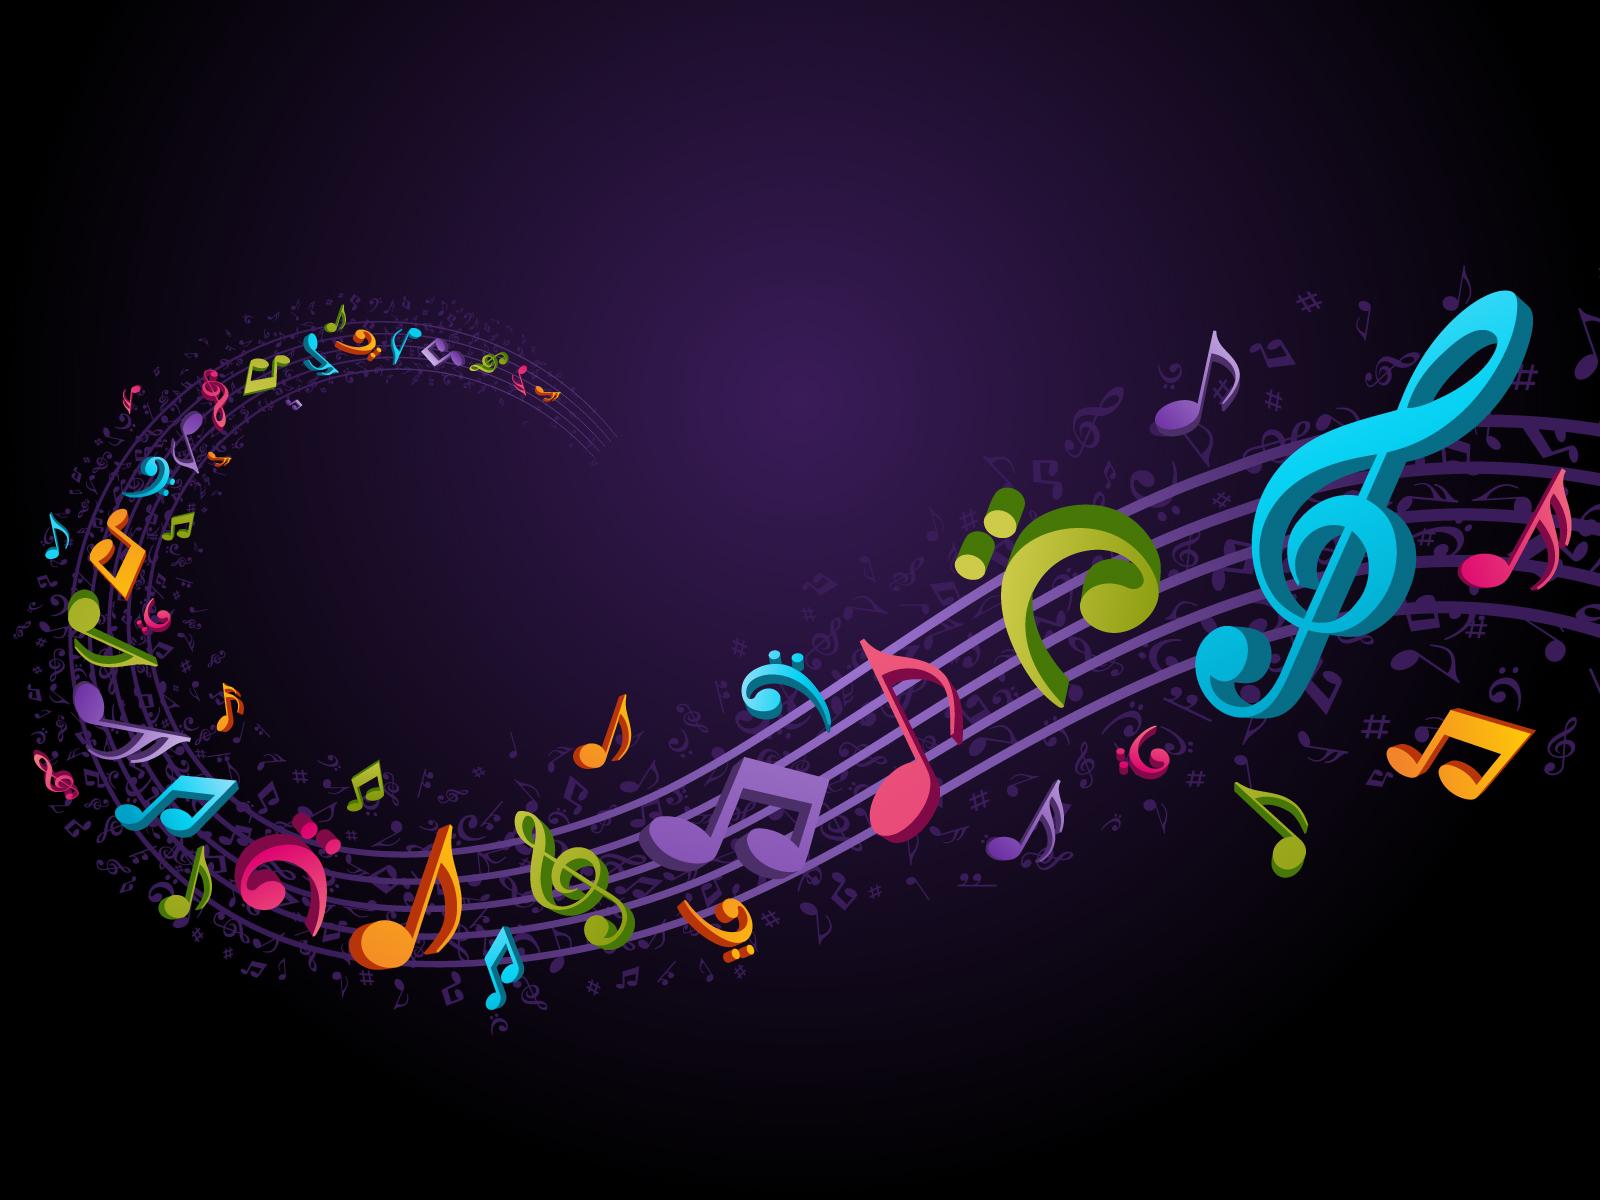 Music Wallpaper 6441